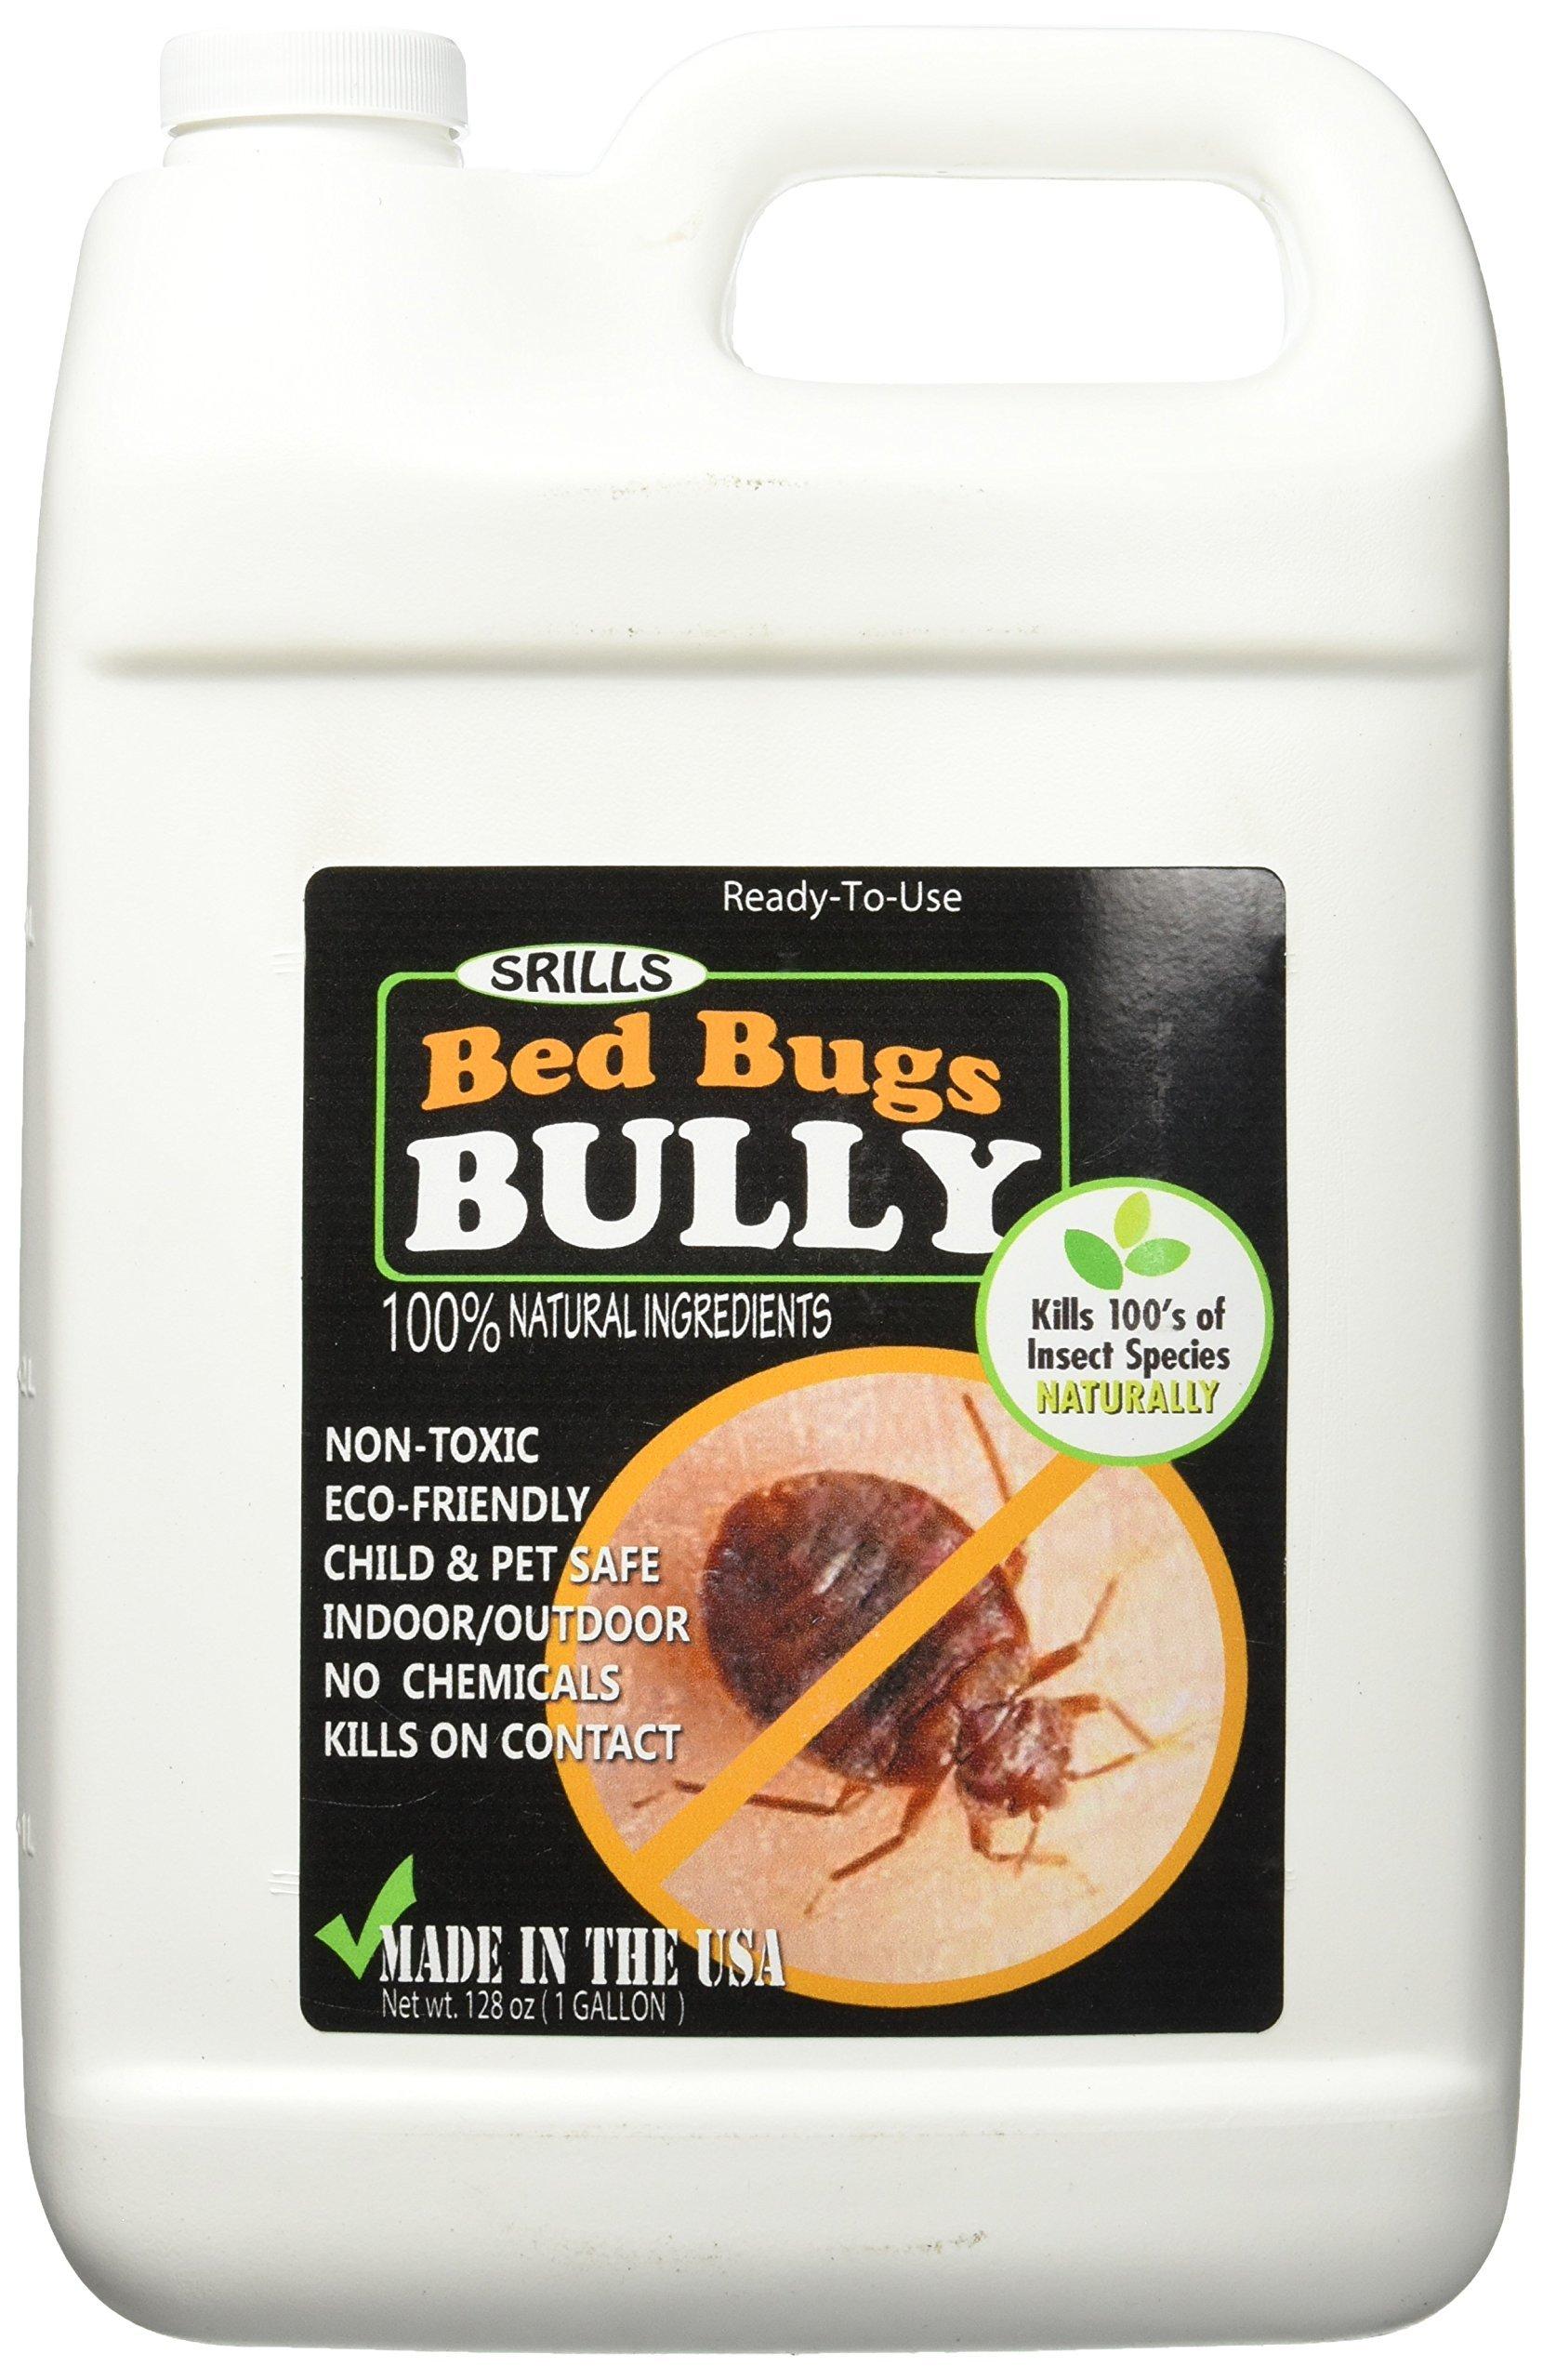 Bed Bugs Bully Non-Toxic Bed Bug Killer Spray Control Repellent All-Natural (1 Gallon)